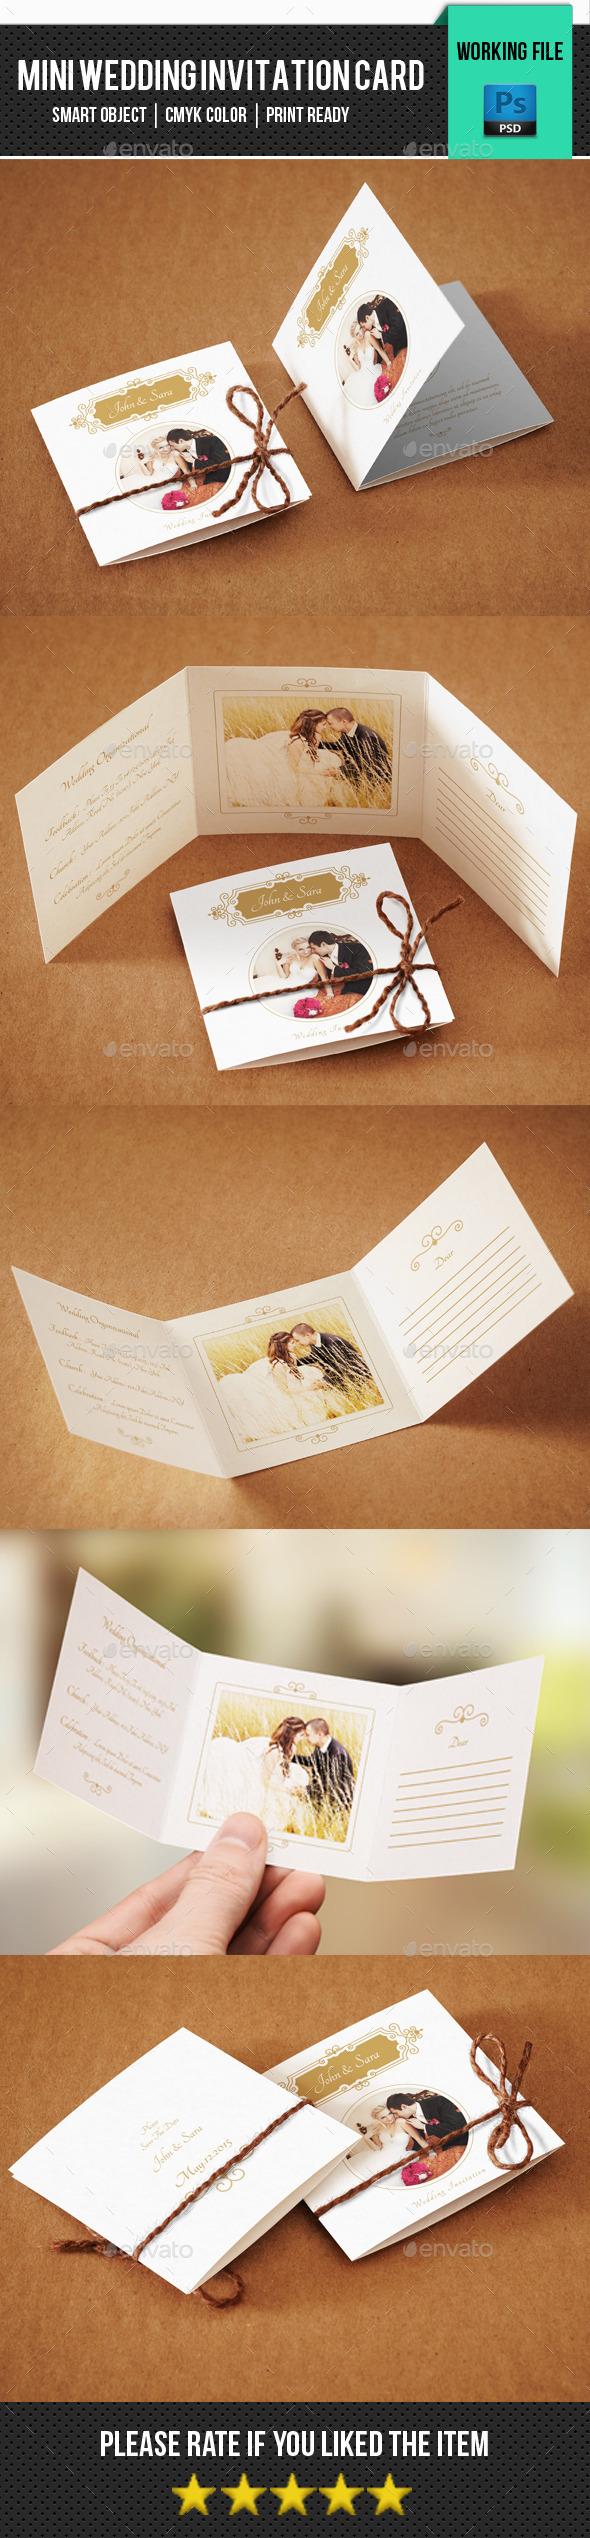 Wedding Mini Invitation Card-V01 - Greeting Cards Cards & Invites